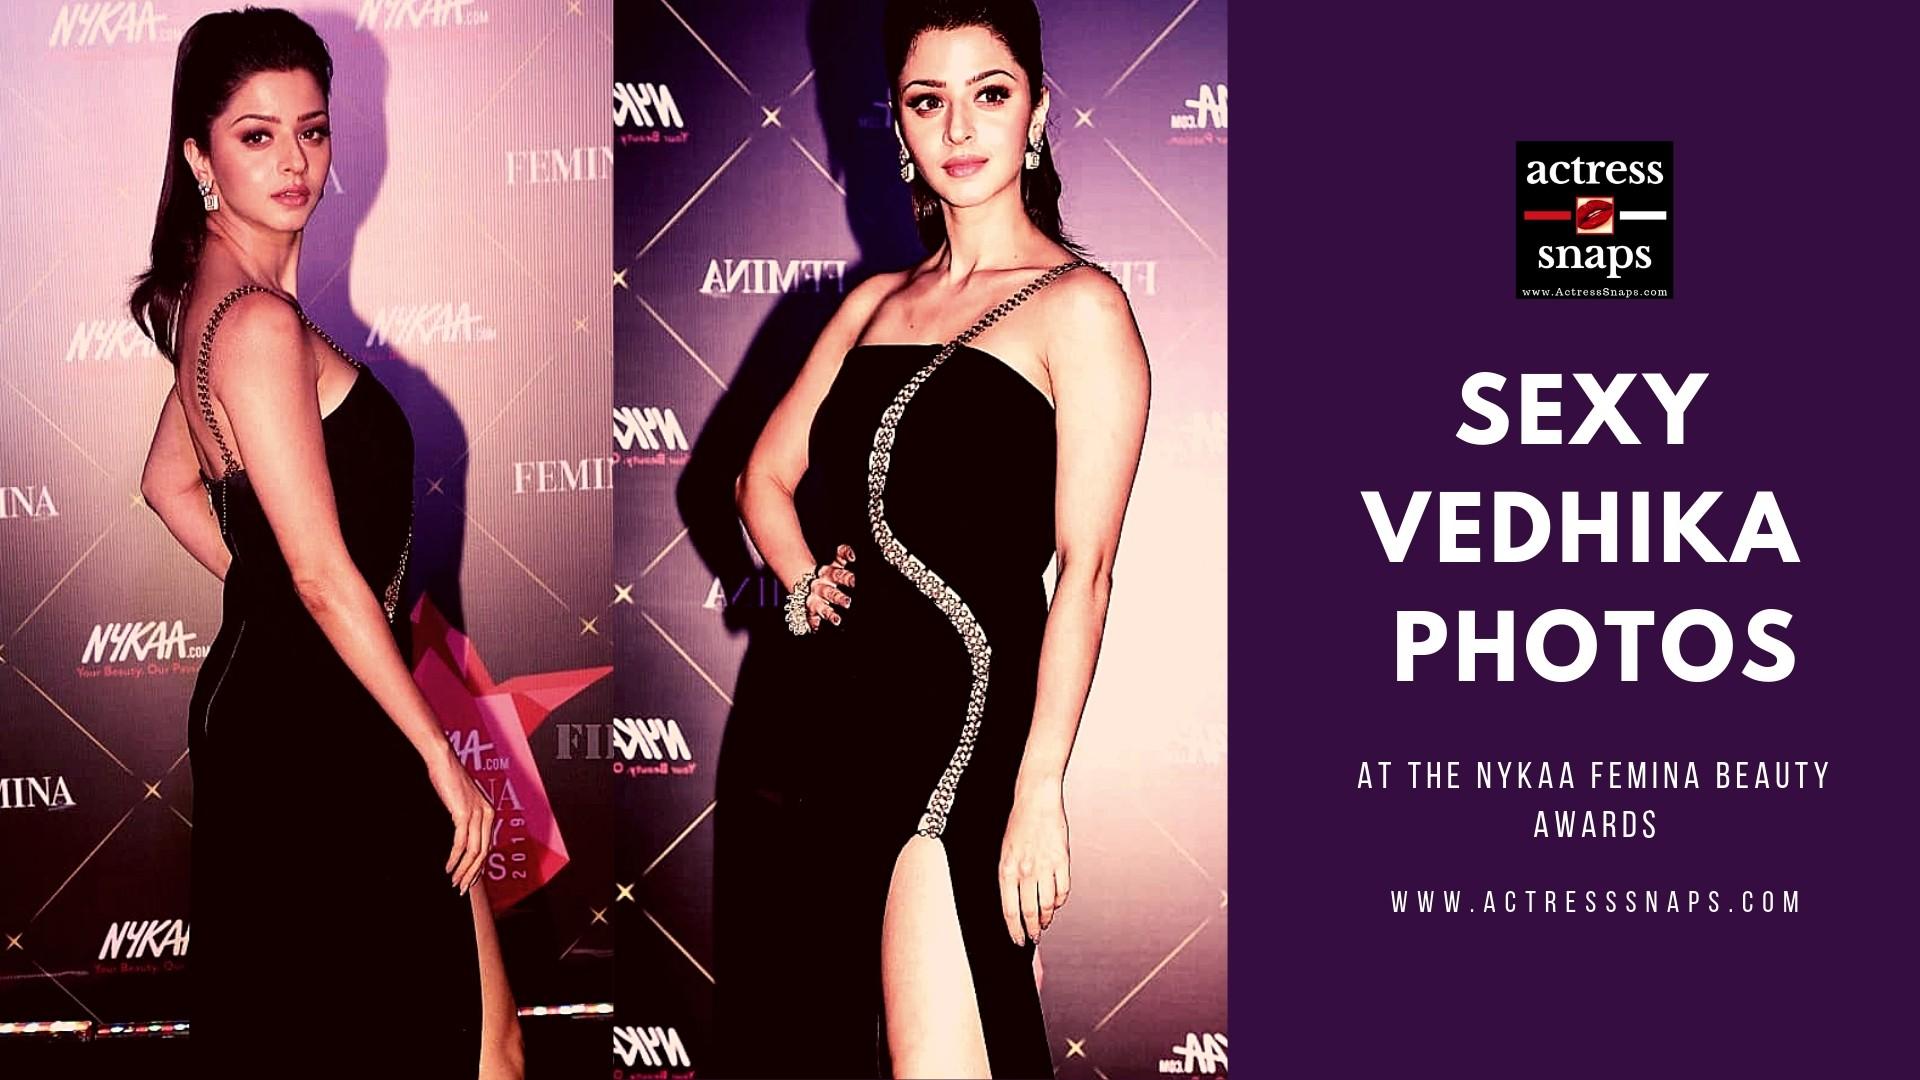 Vedhika Photos from Nyka Femina Awards - Sexy Actress Pictures   Hot Actress Pictures - ActressSnaps.com